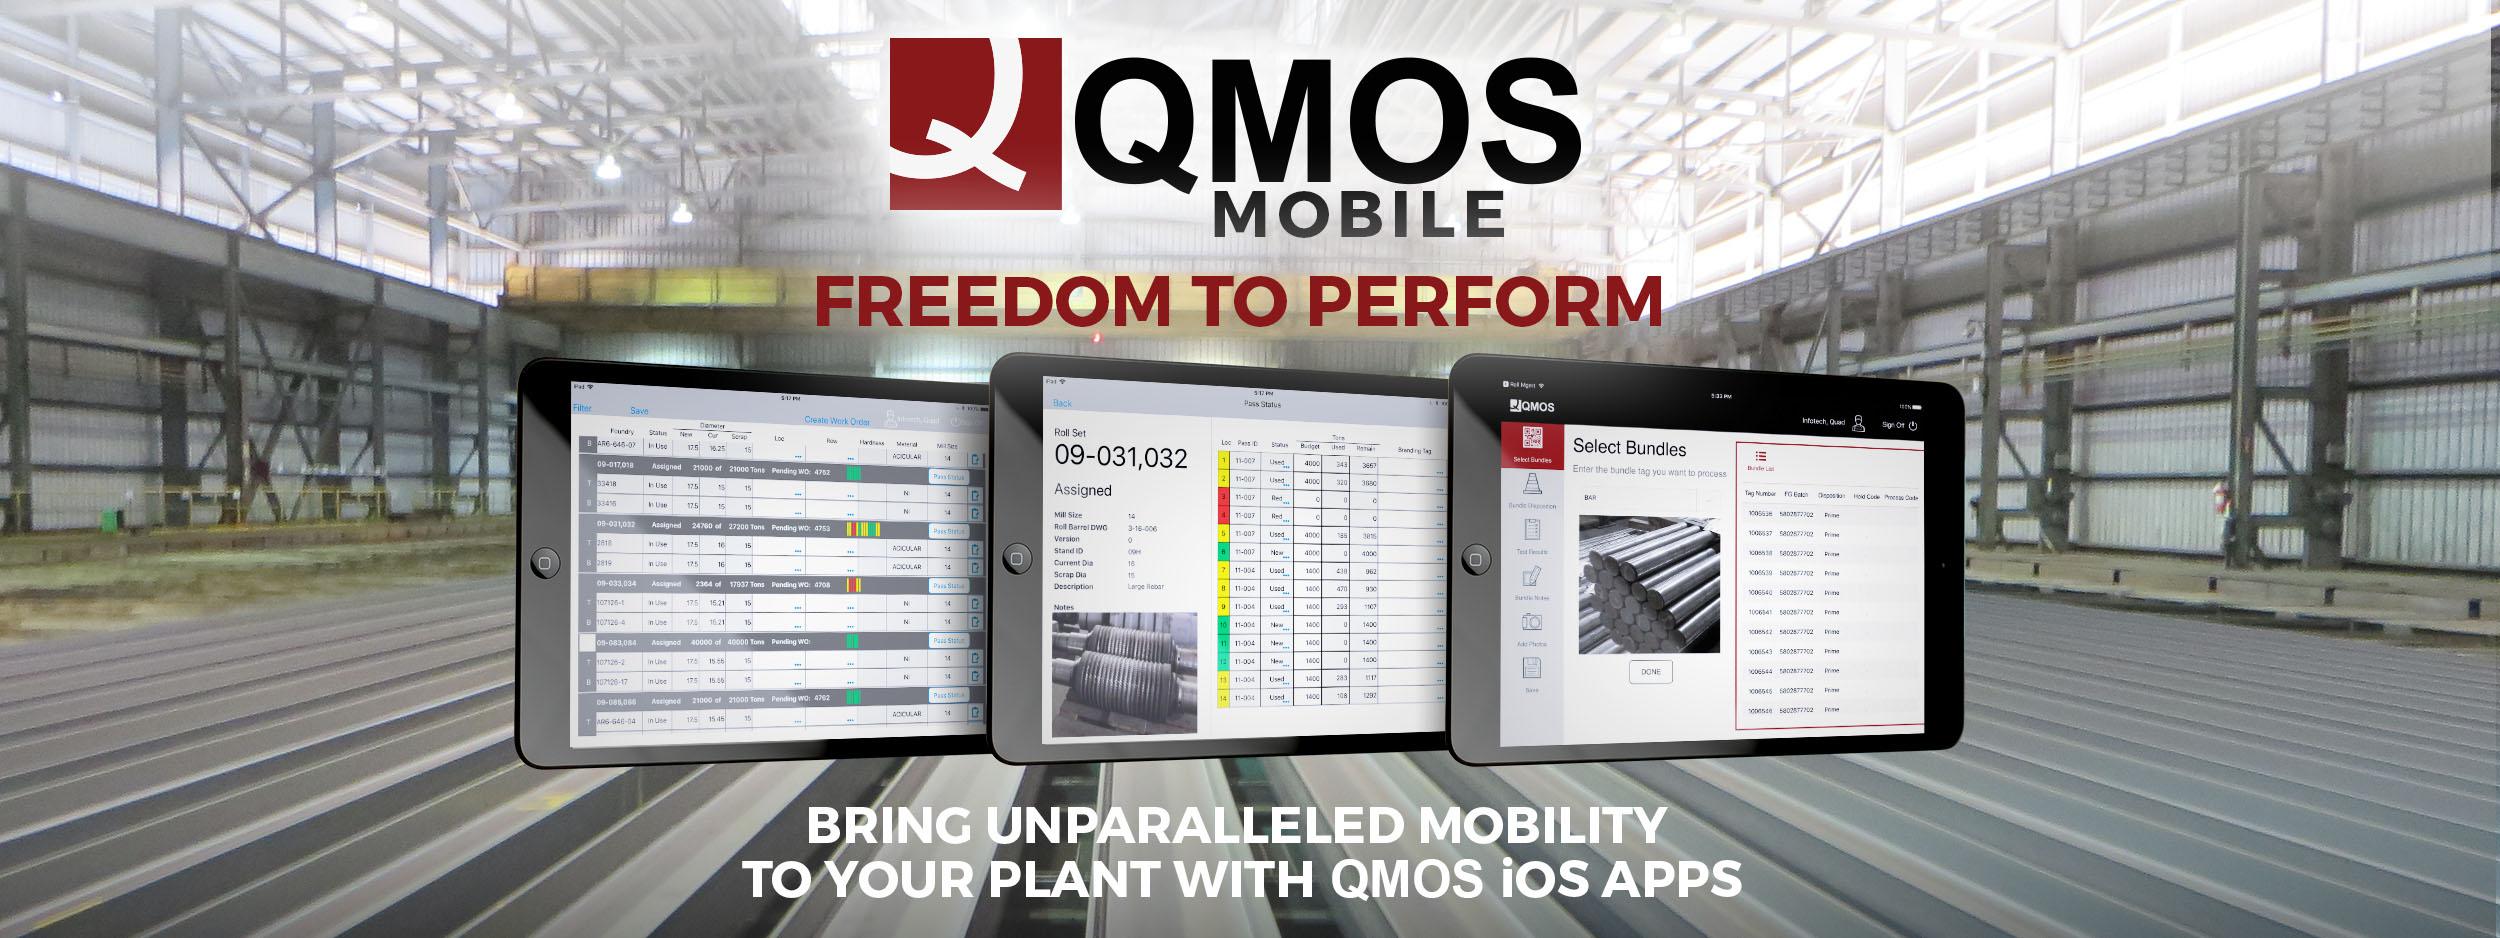 QMOS mobile